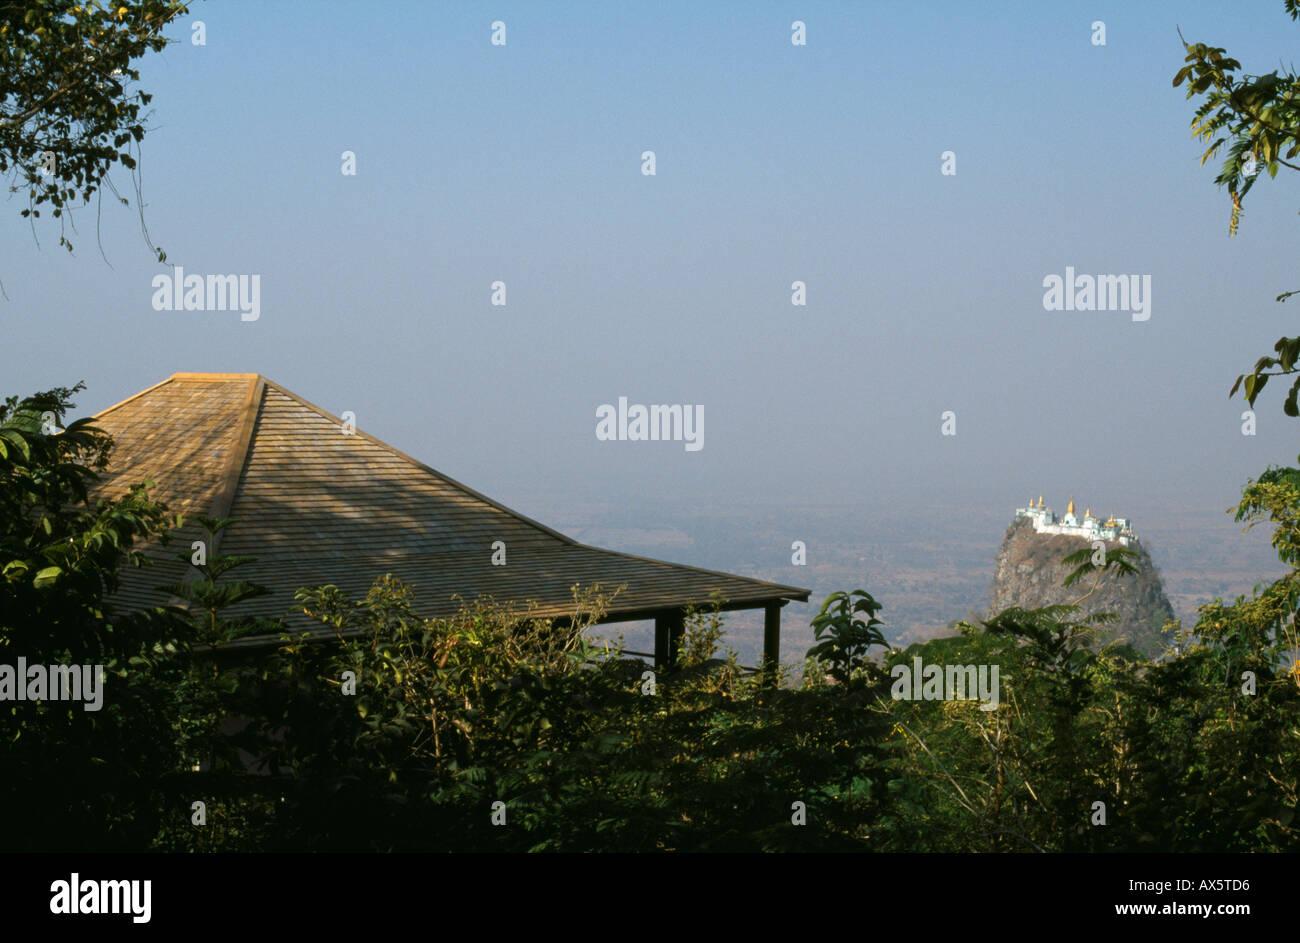 mount popa in myanmar, viewed from the popa mountain resort hotel